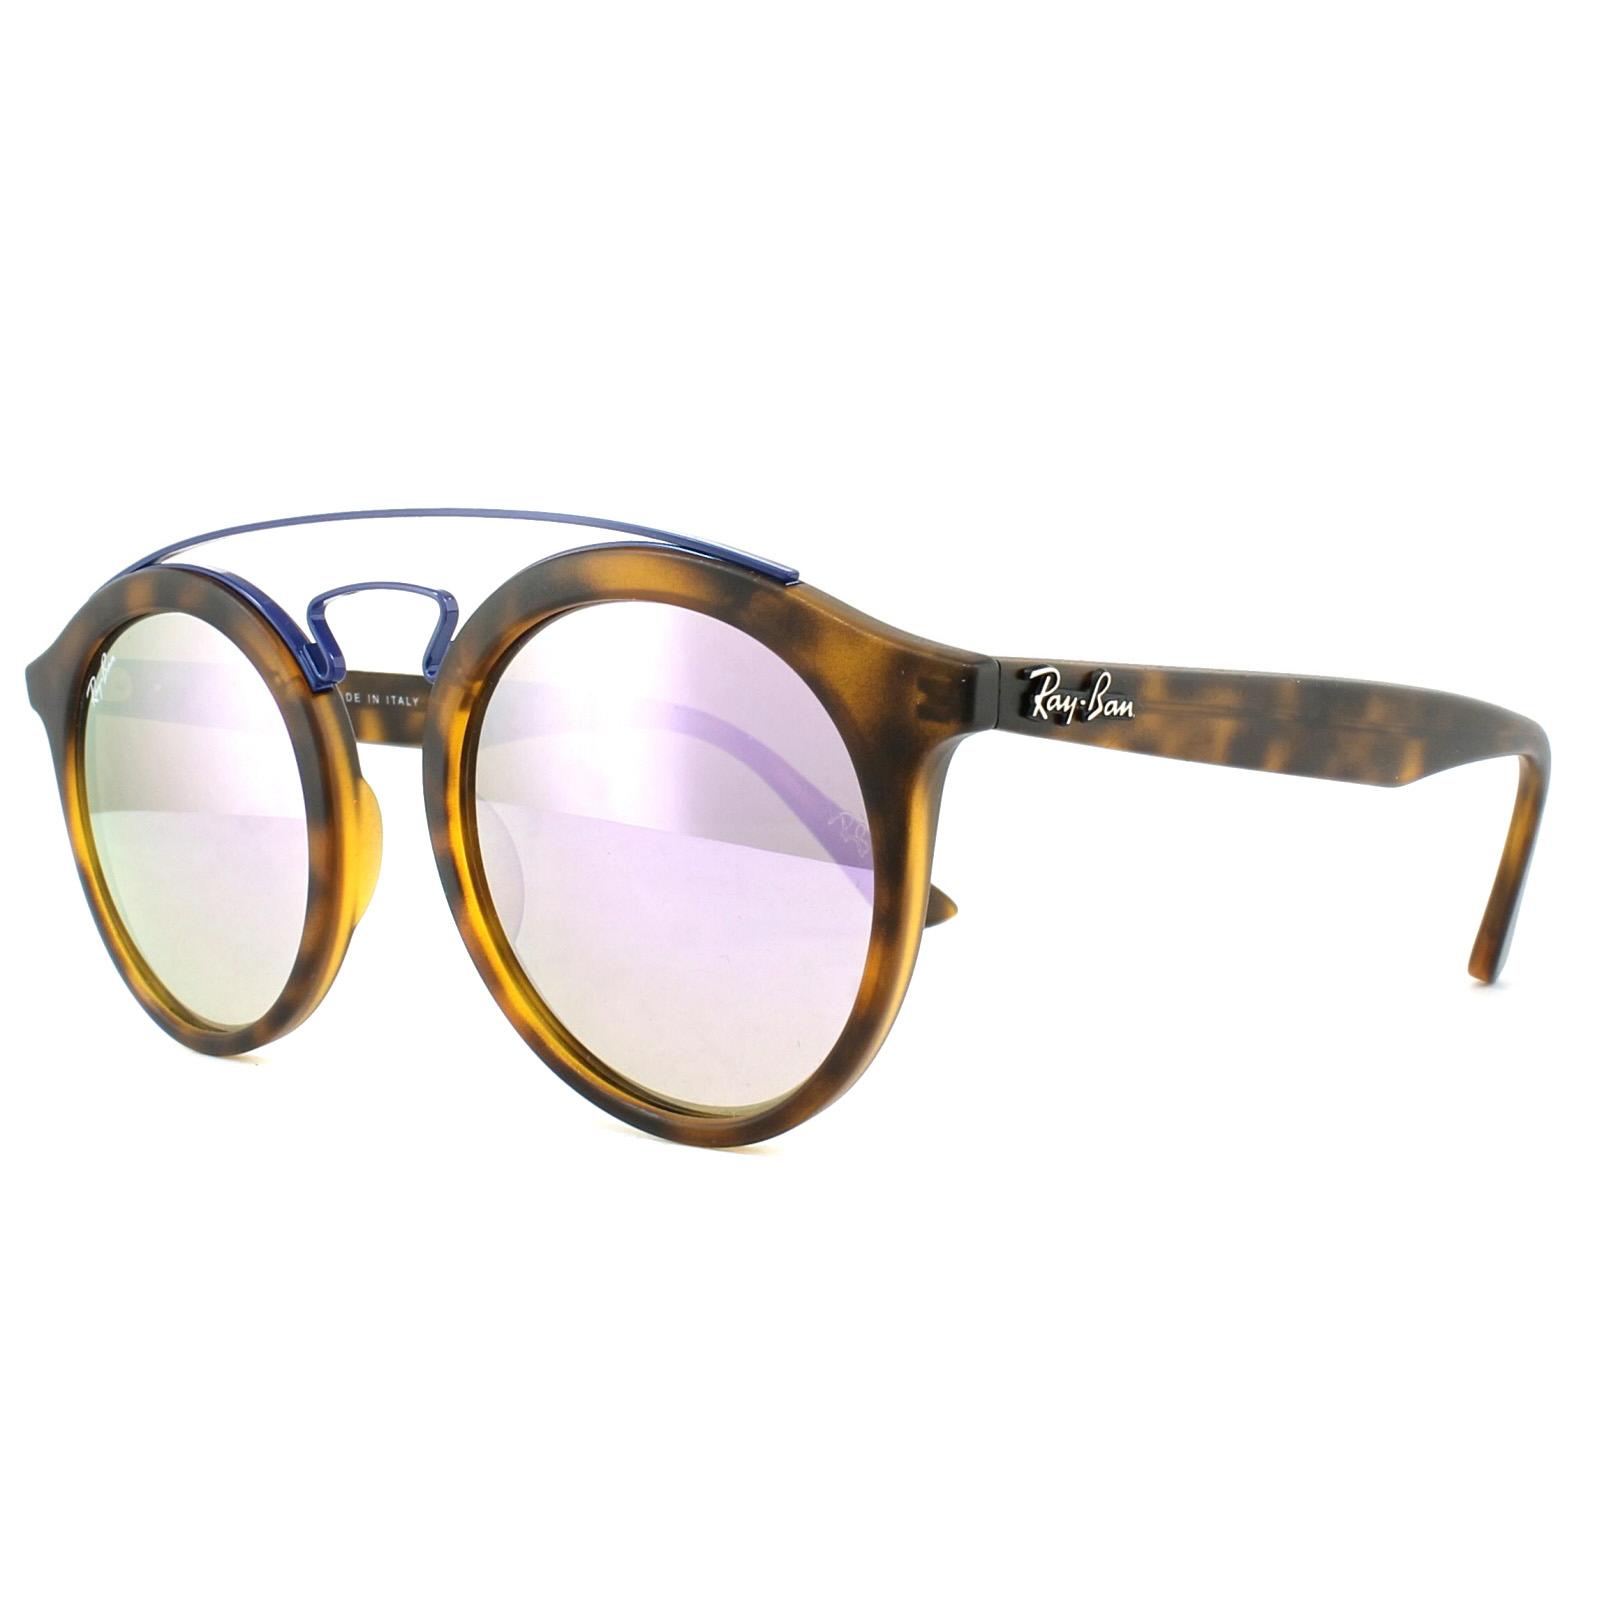 Sentinel Ray-Ban Sunglasses Gatsby 4256 6266B0 Tortoise Lilac Gradient  Mirror 49mm 5940b11afd1c